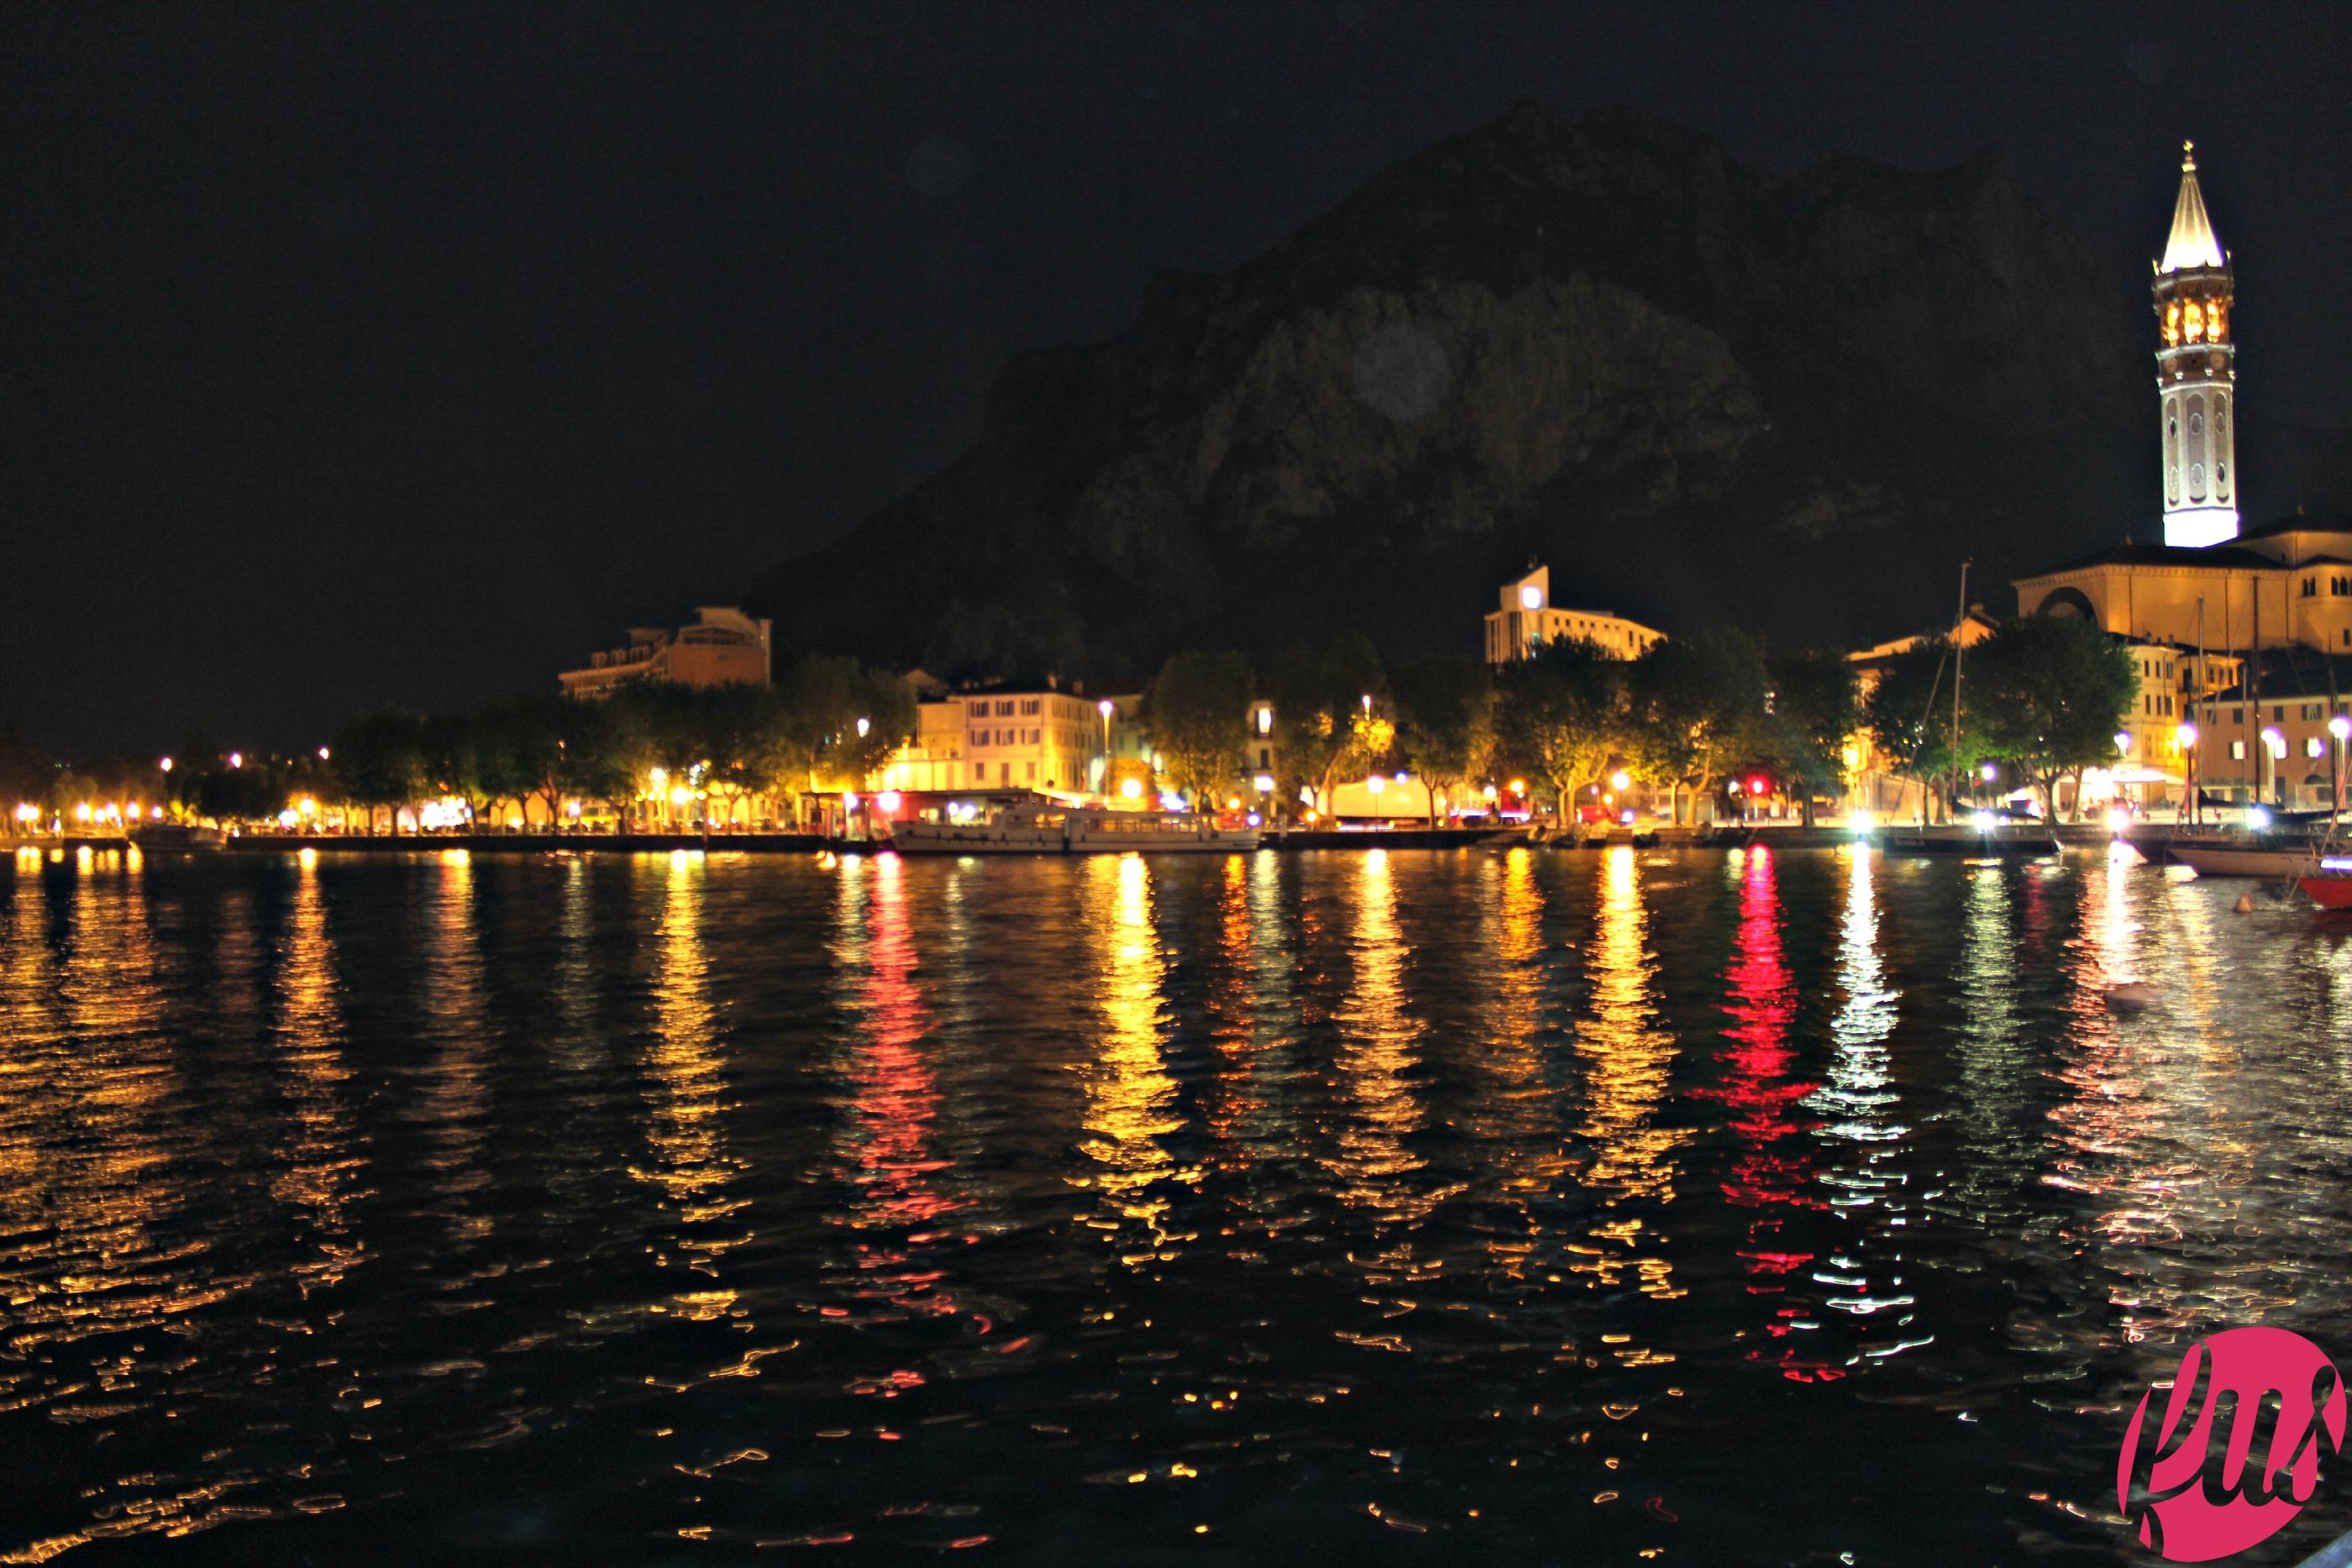 Night_on_the_lake